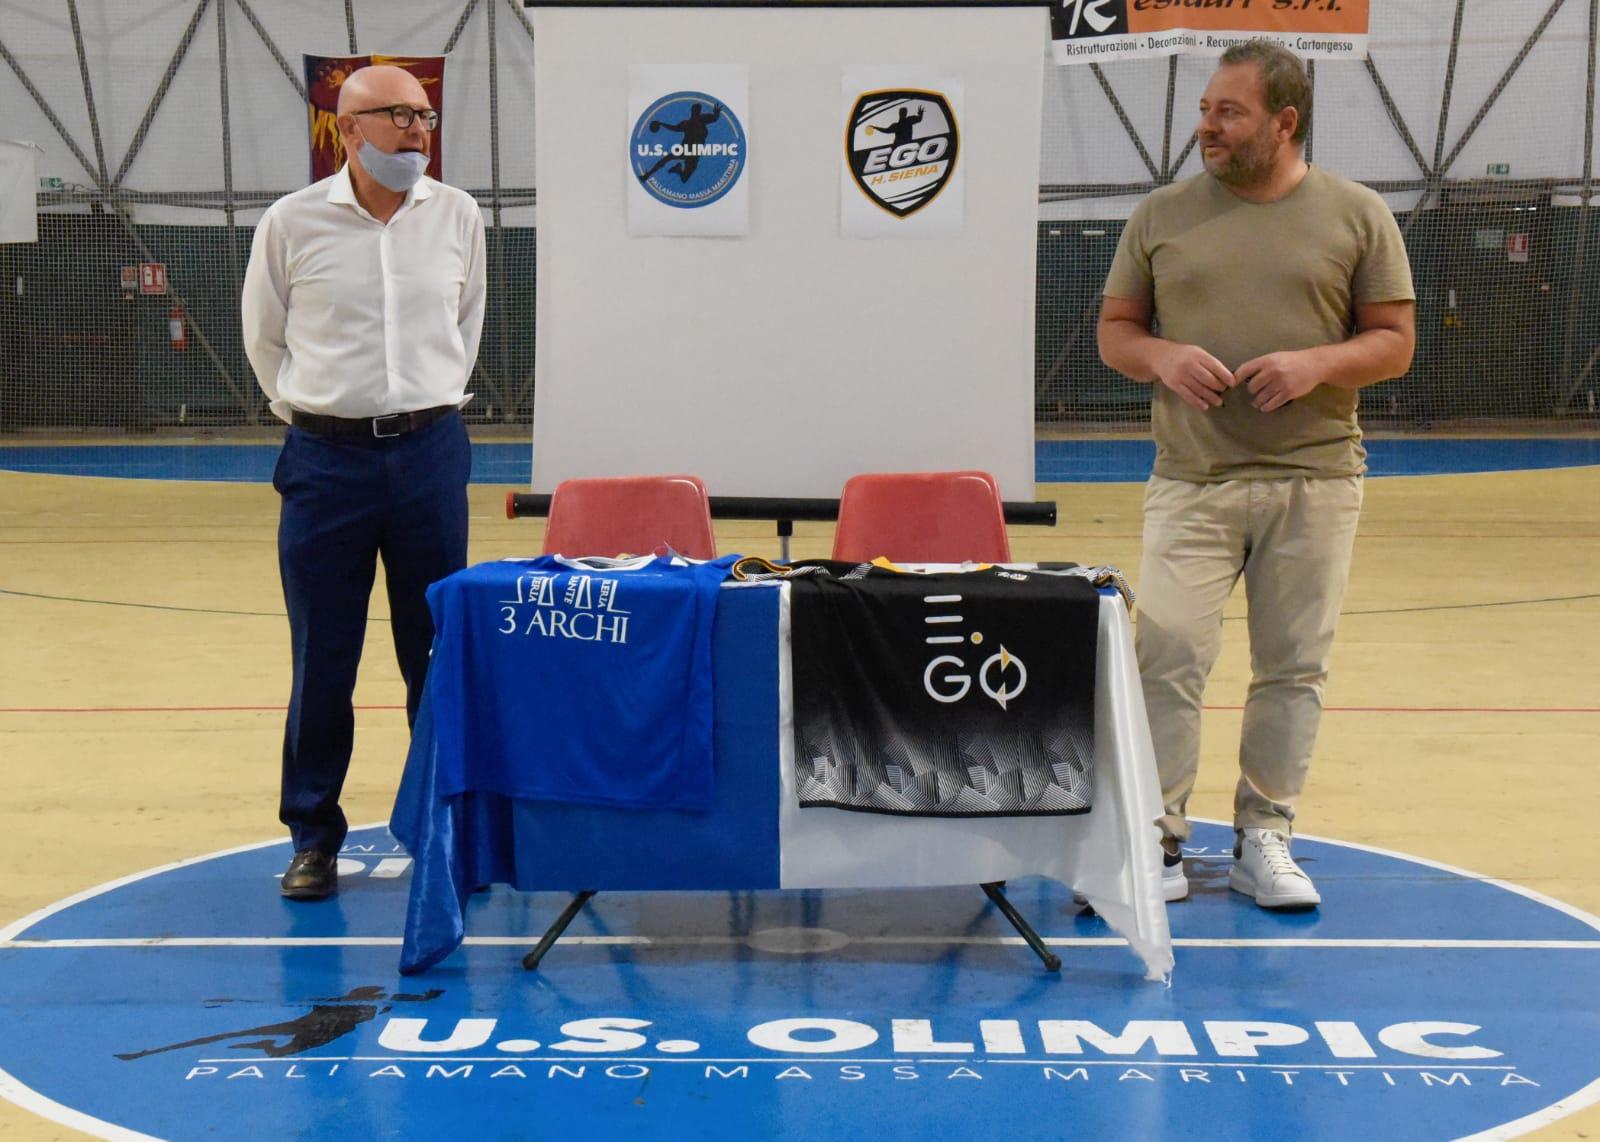 pallamano Ego Handball Siena & Olimpic Massa Marittima